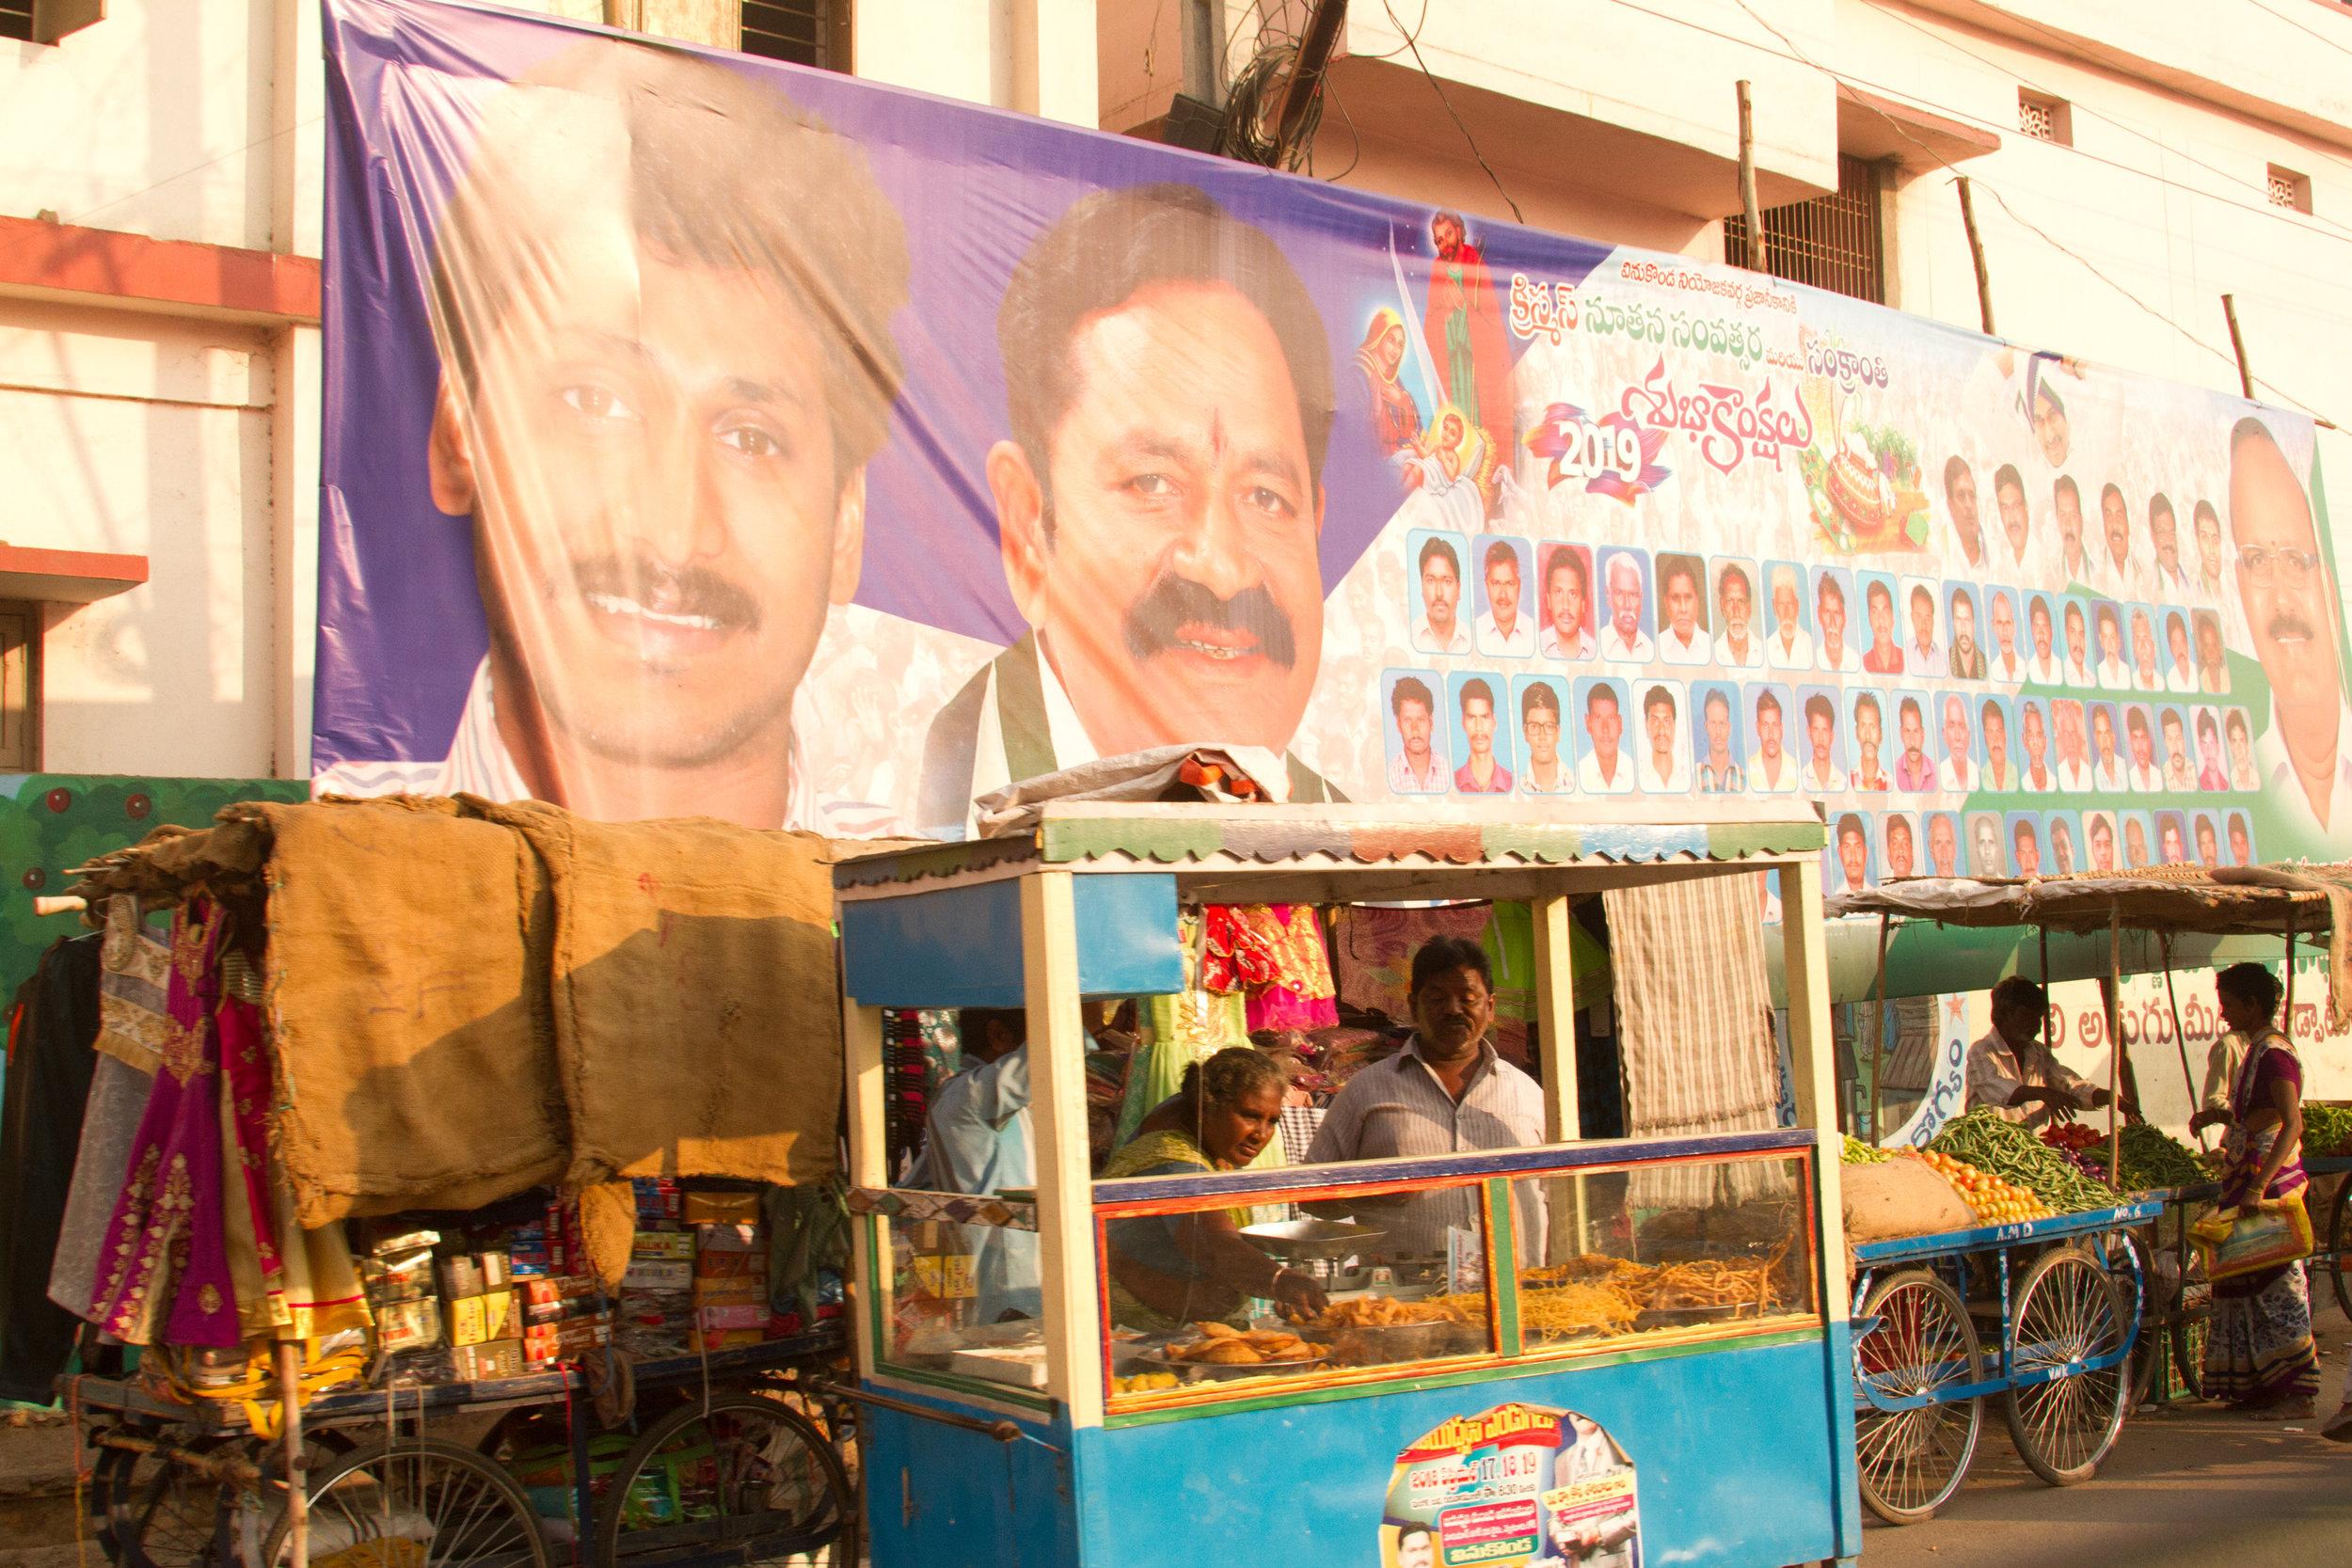 Vinukonda India, street scene. Note the political ads.